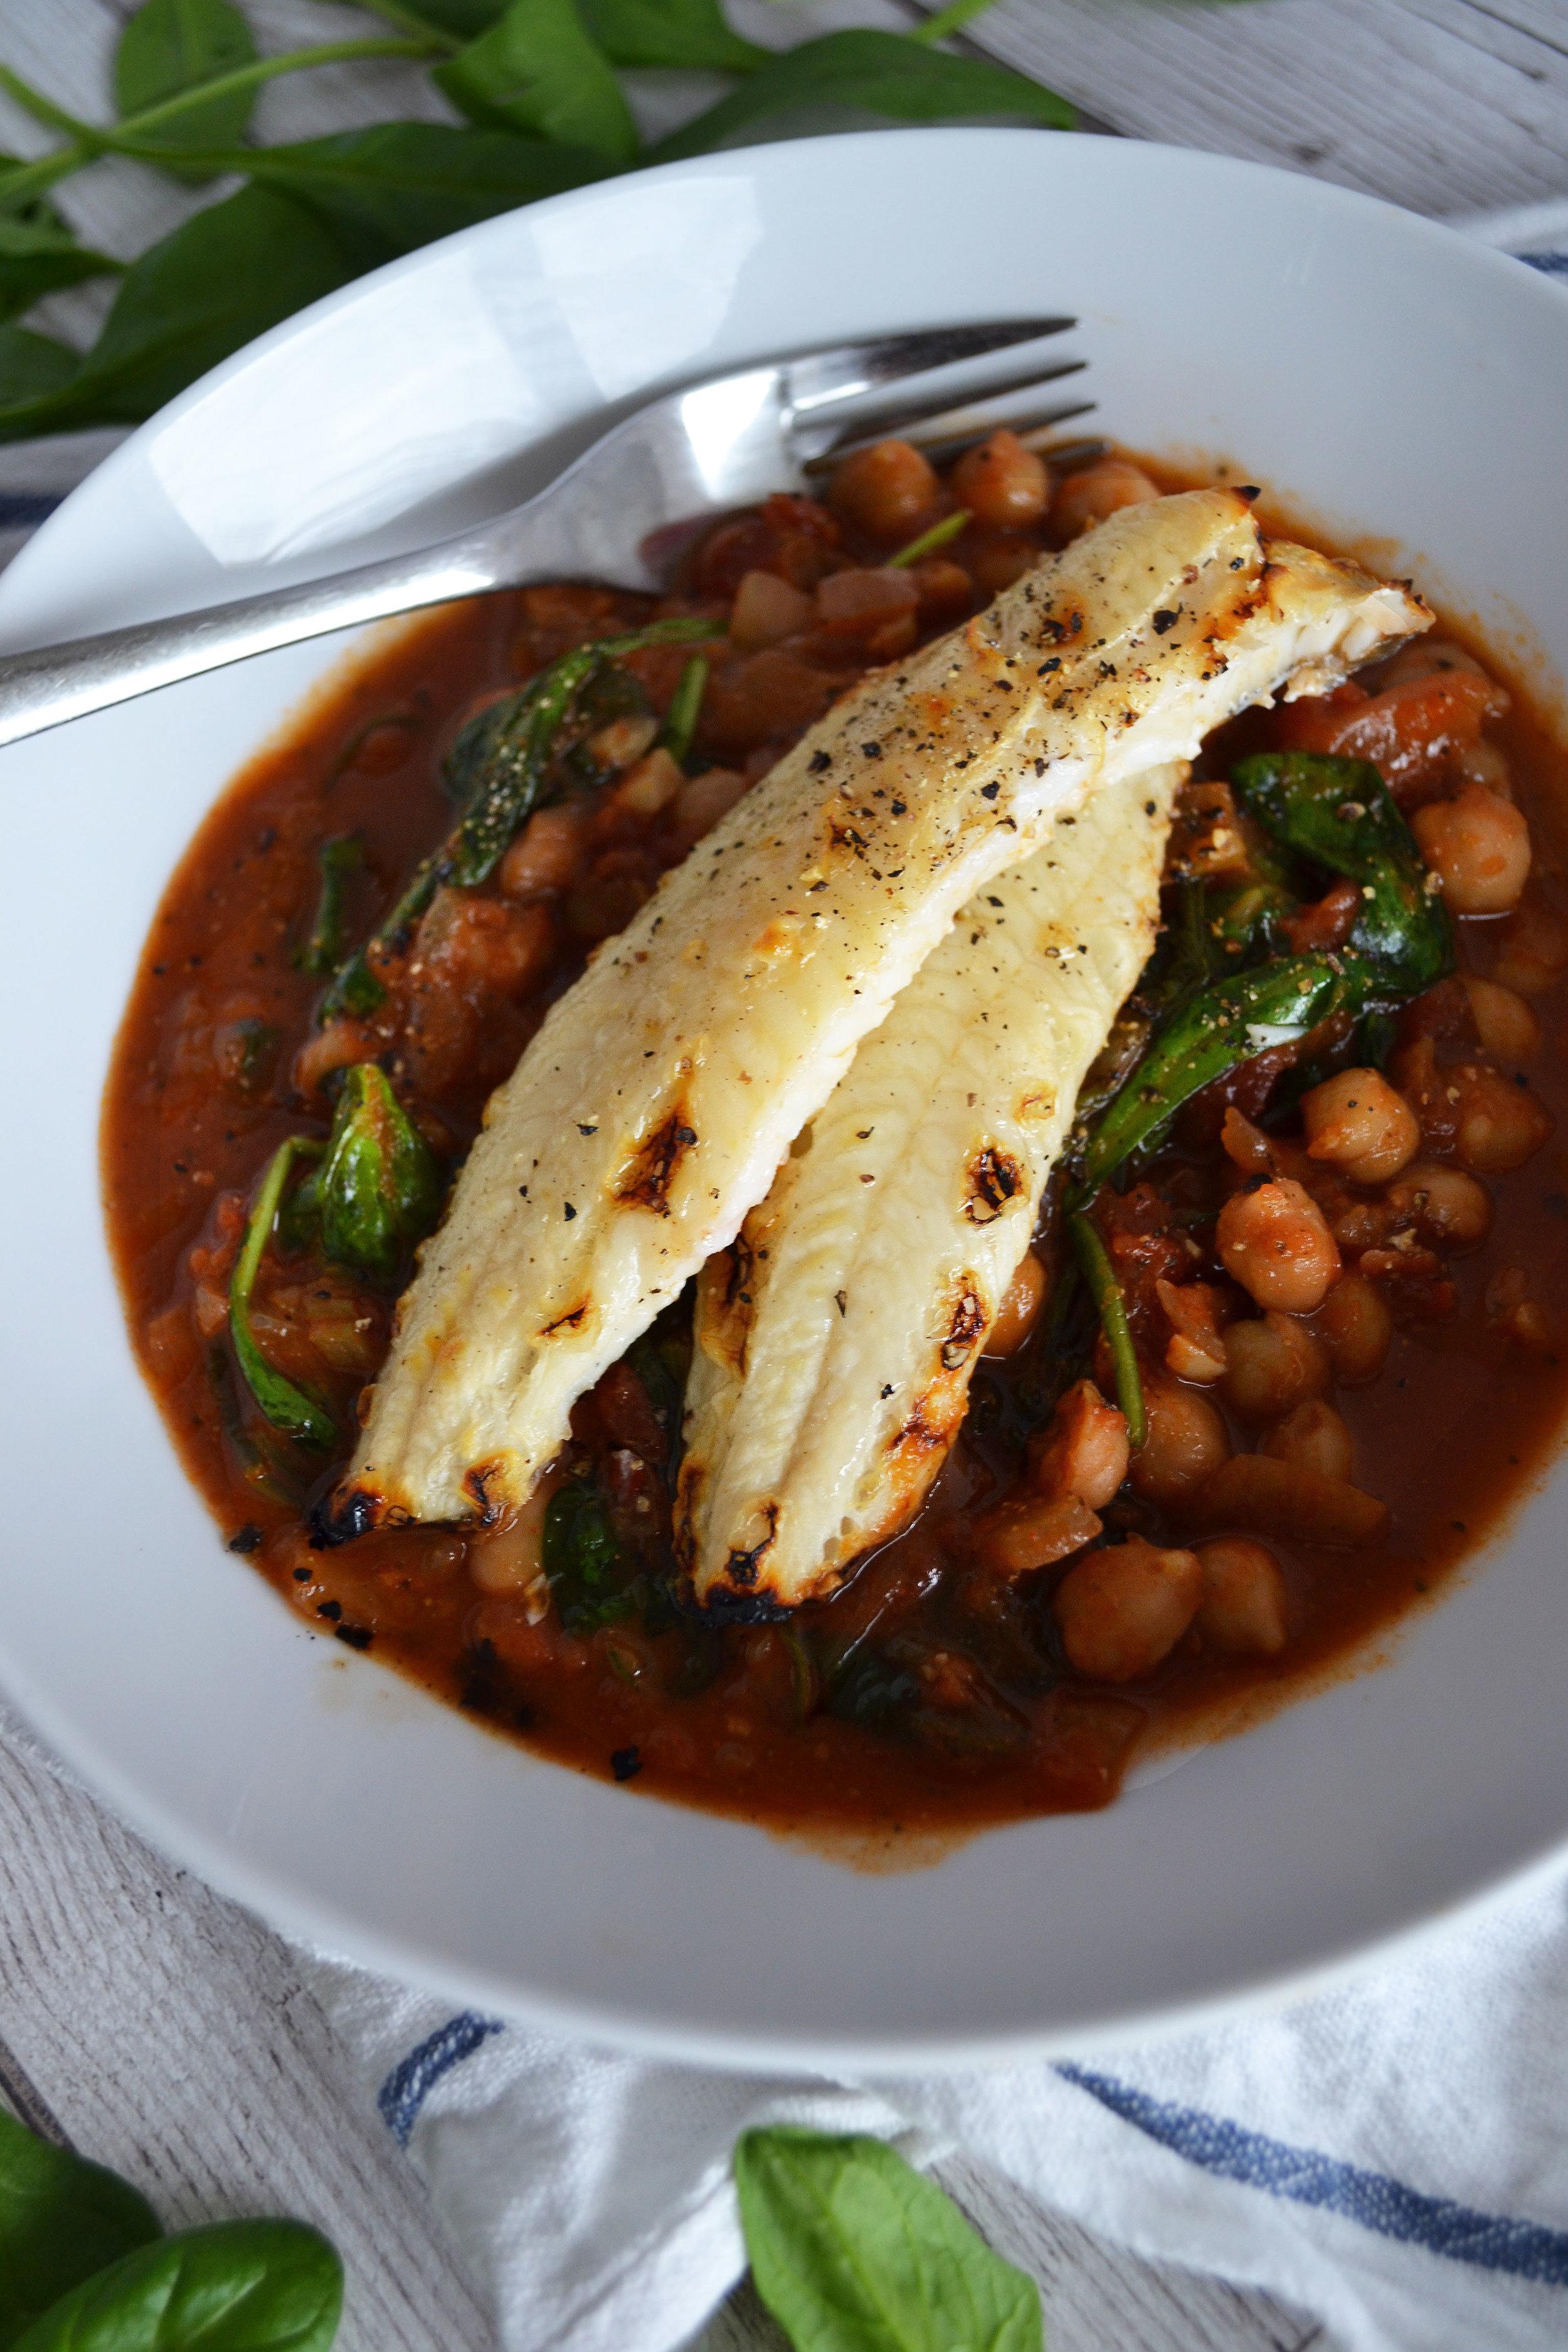 Haddock and chickpea stew | The Flourishing Pantry